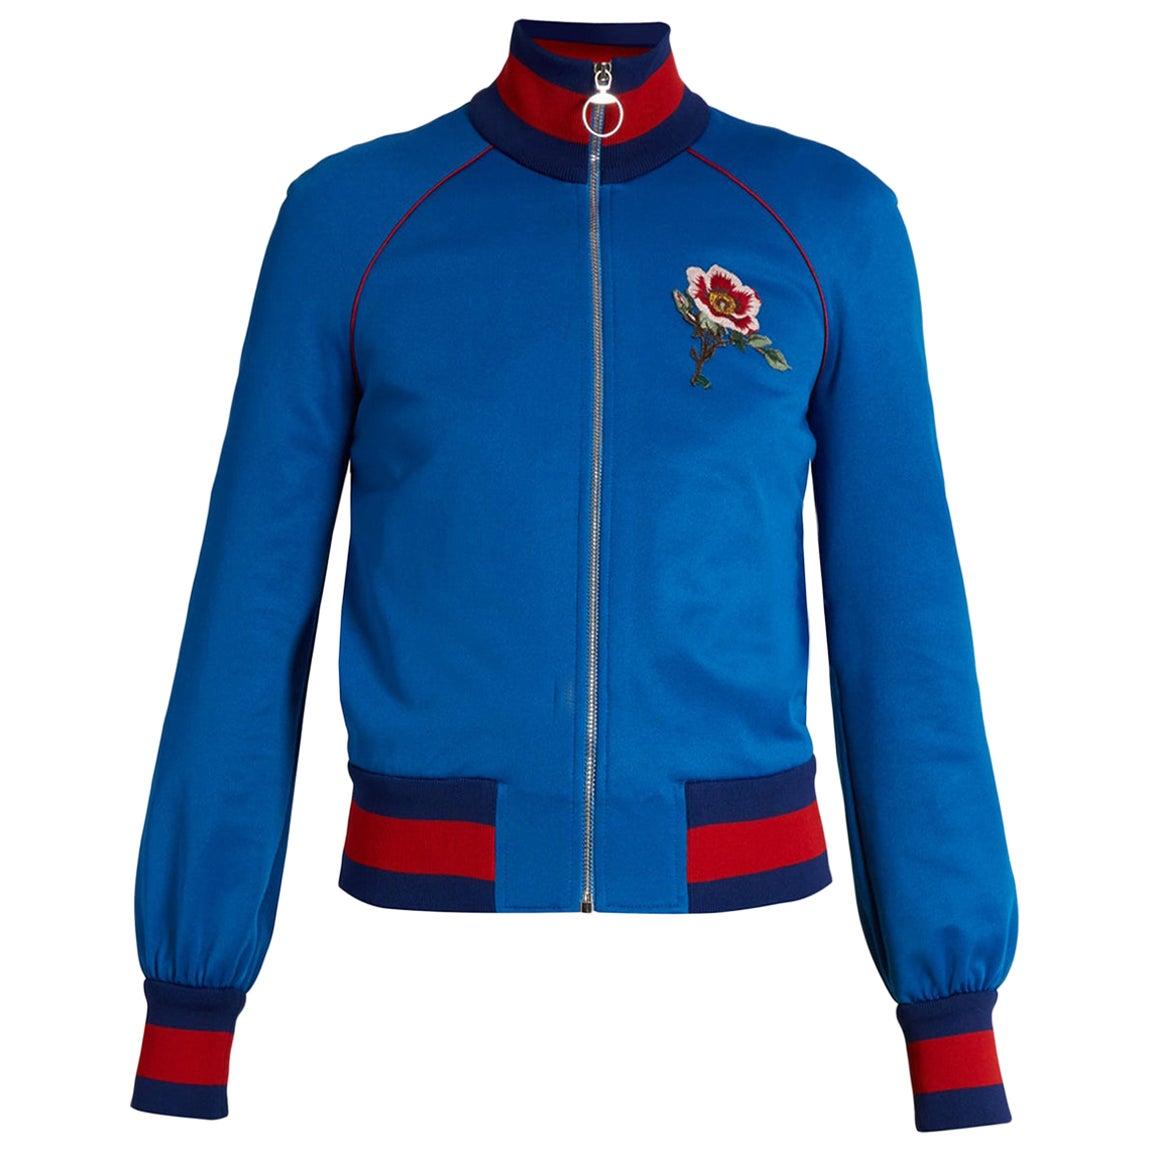 Gucci Appliquéd Satin-Jersey Bomber Jacket